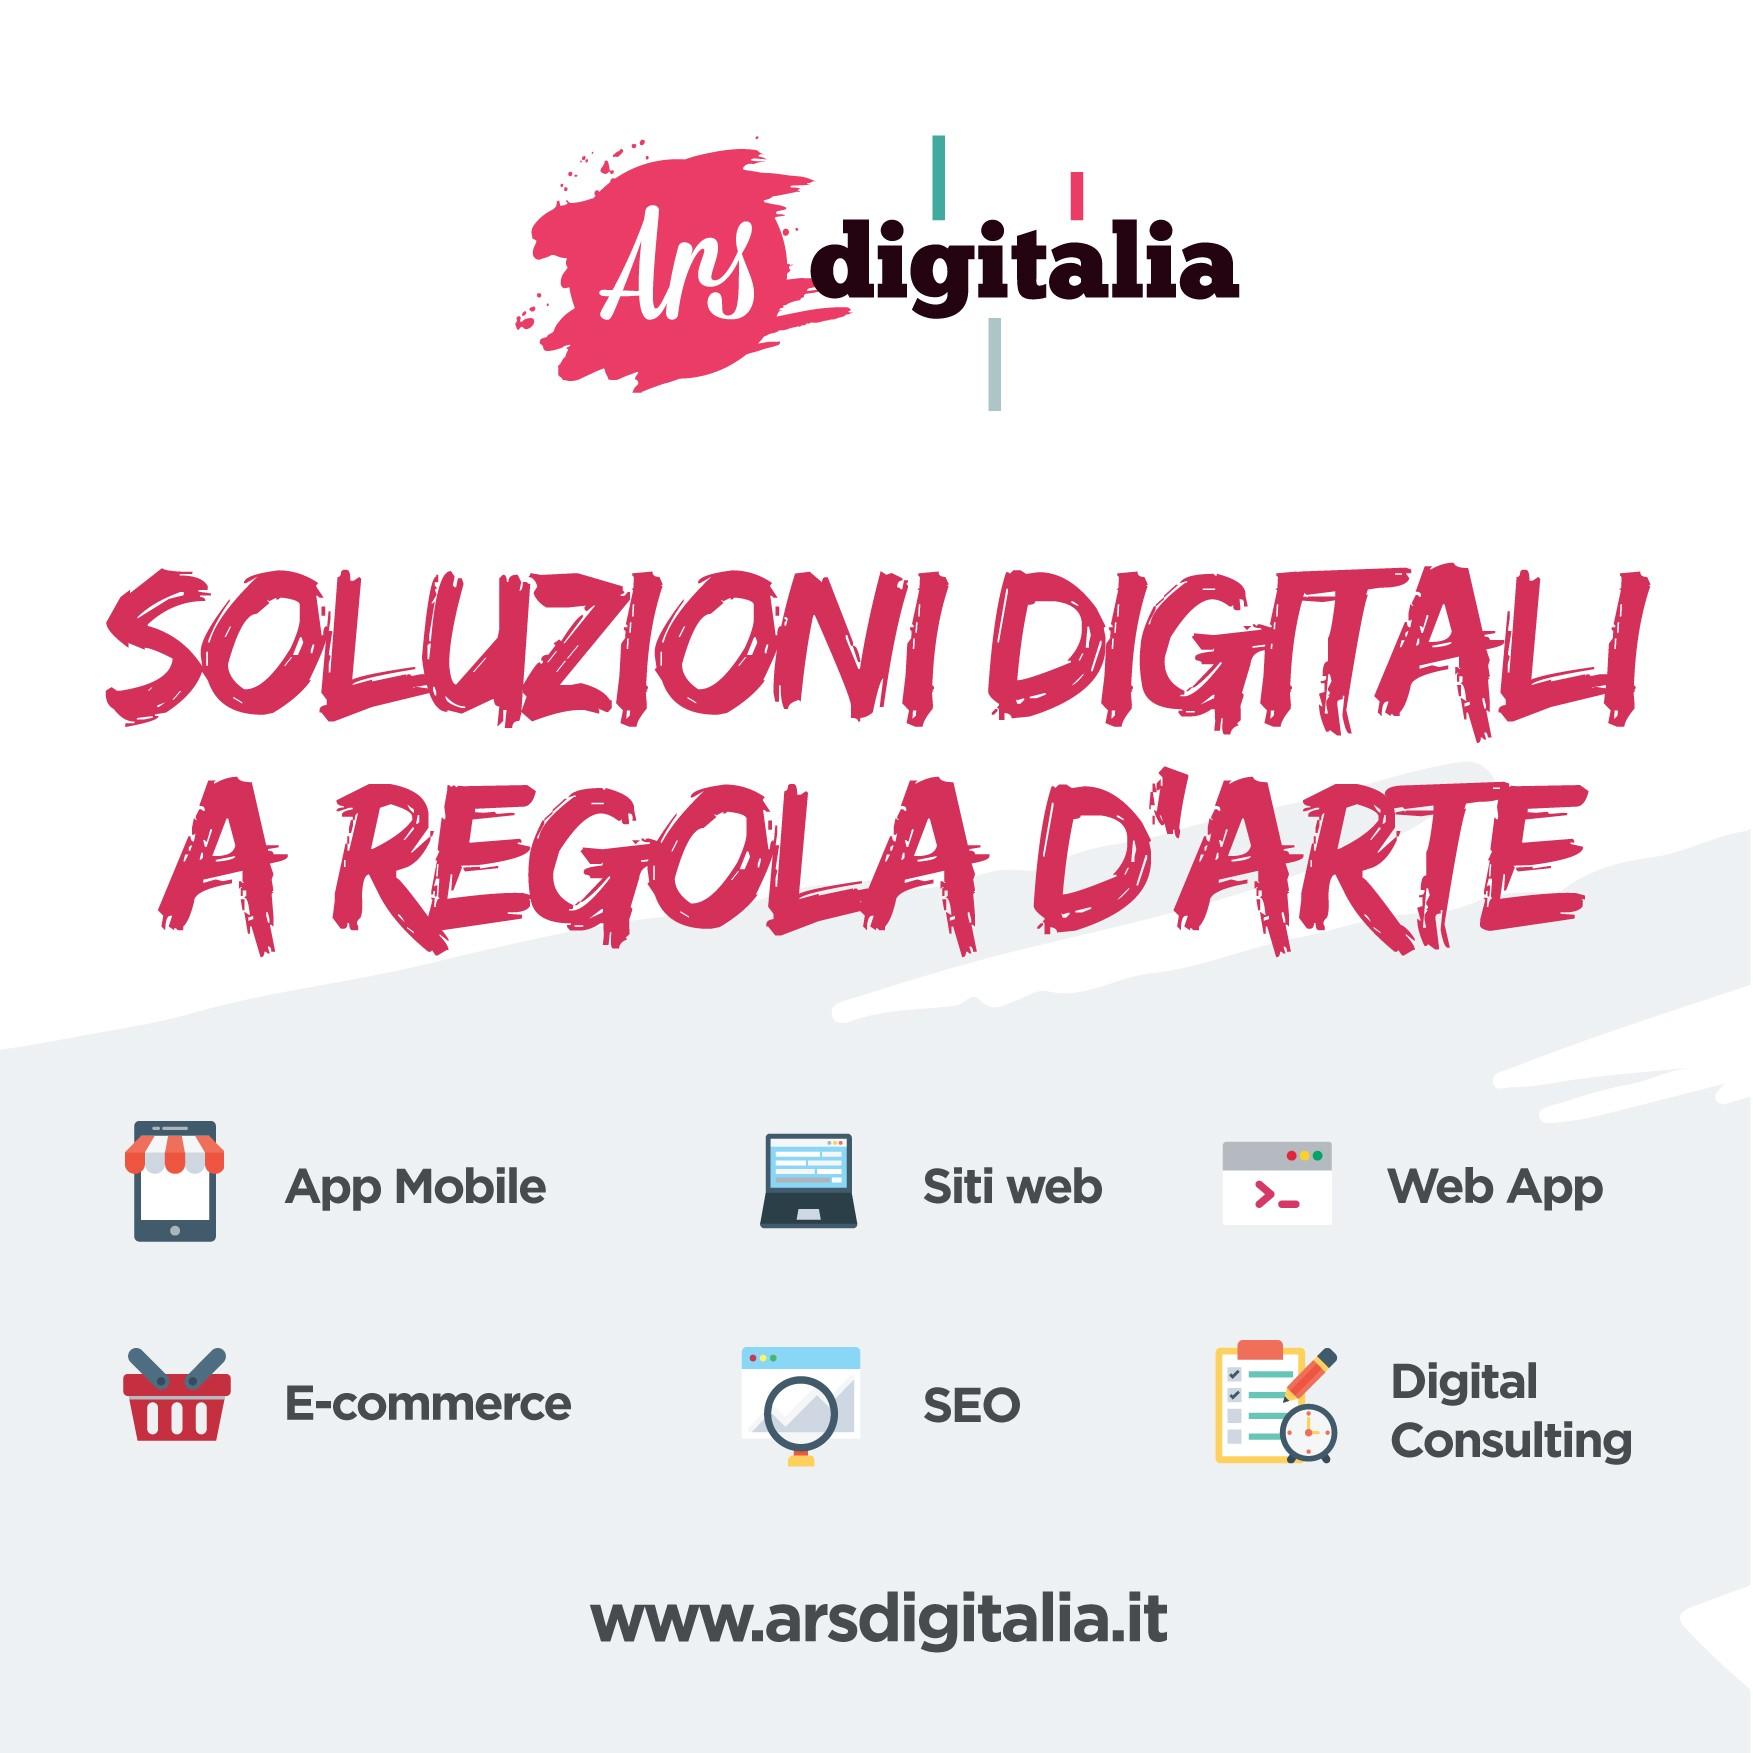 Ars Digitalia srls